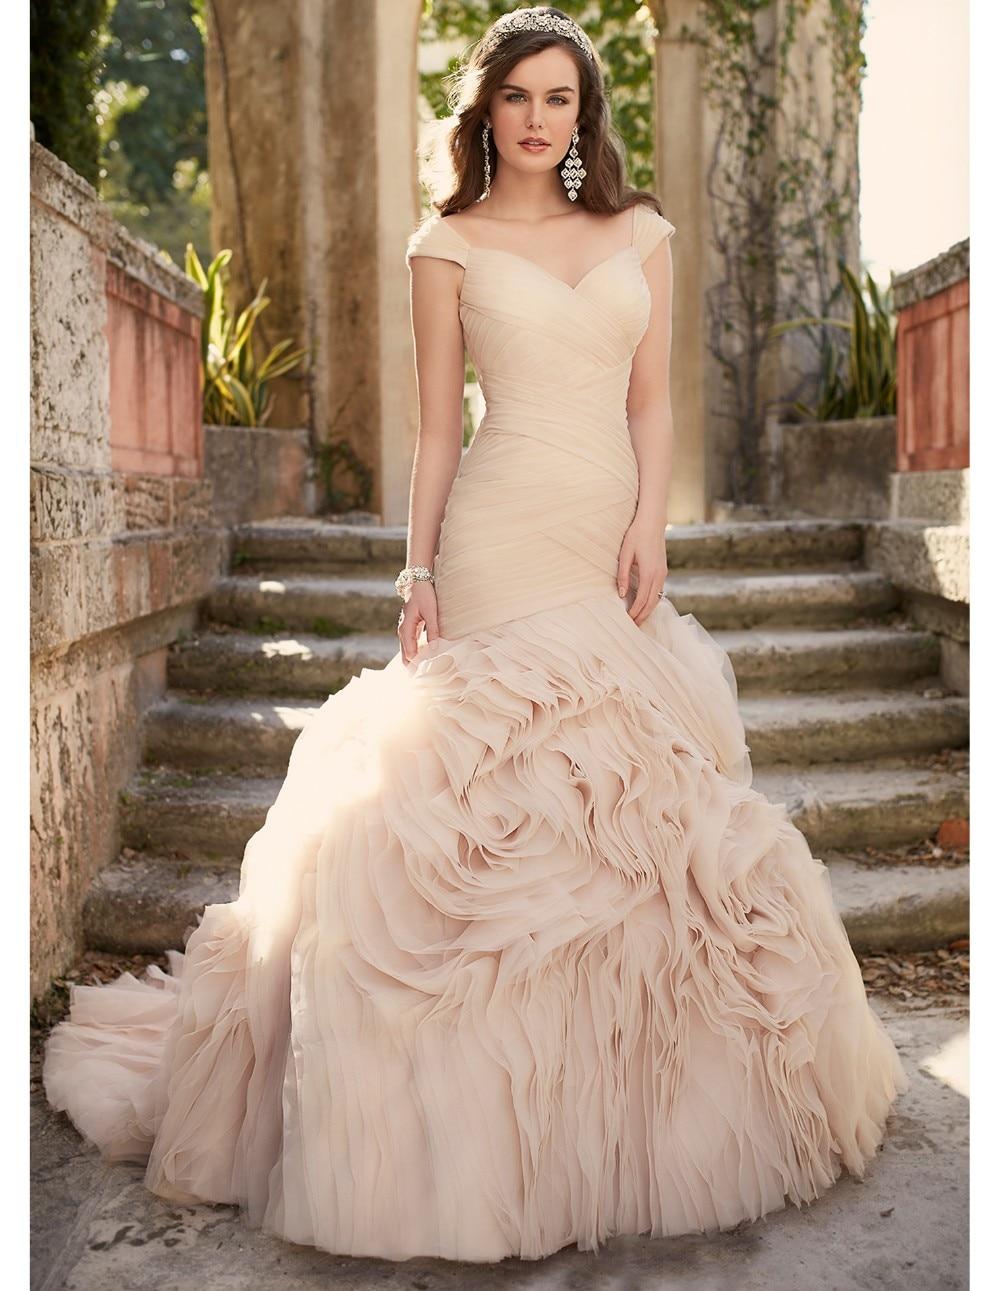 blush wedding dresses blush colored wedding dresses 25 Best Ideas about Blush Wedding Dresses on Pinterest Blush wedding gown colours Brides and Blush wedding gowns